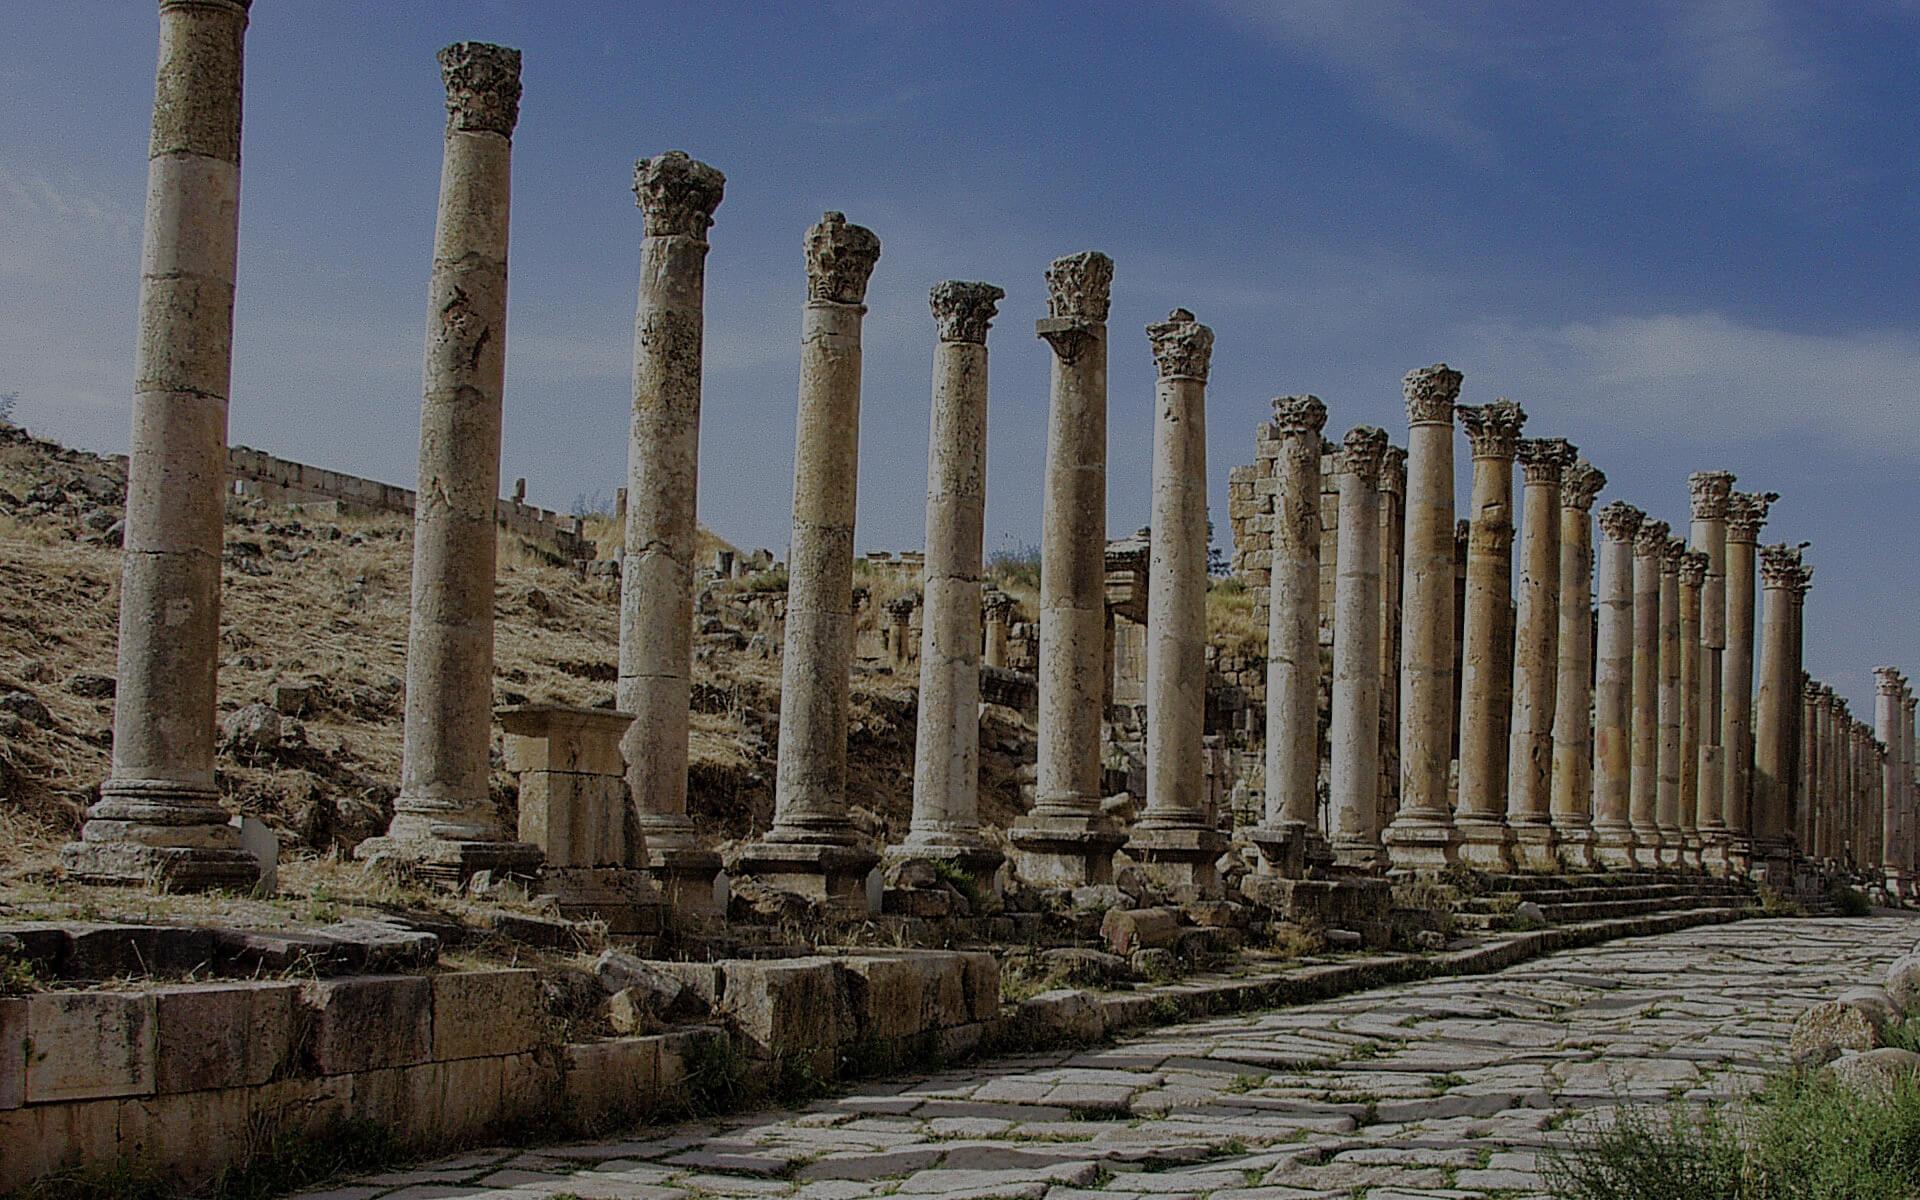 Arheološka istraživanja i kamenoklesarske usluge